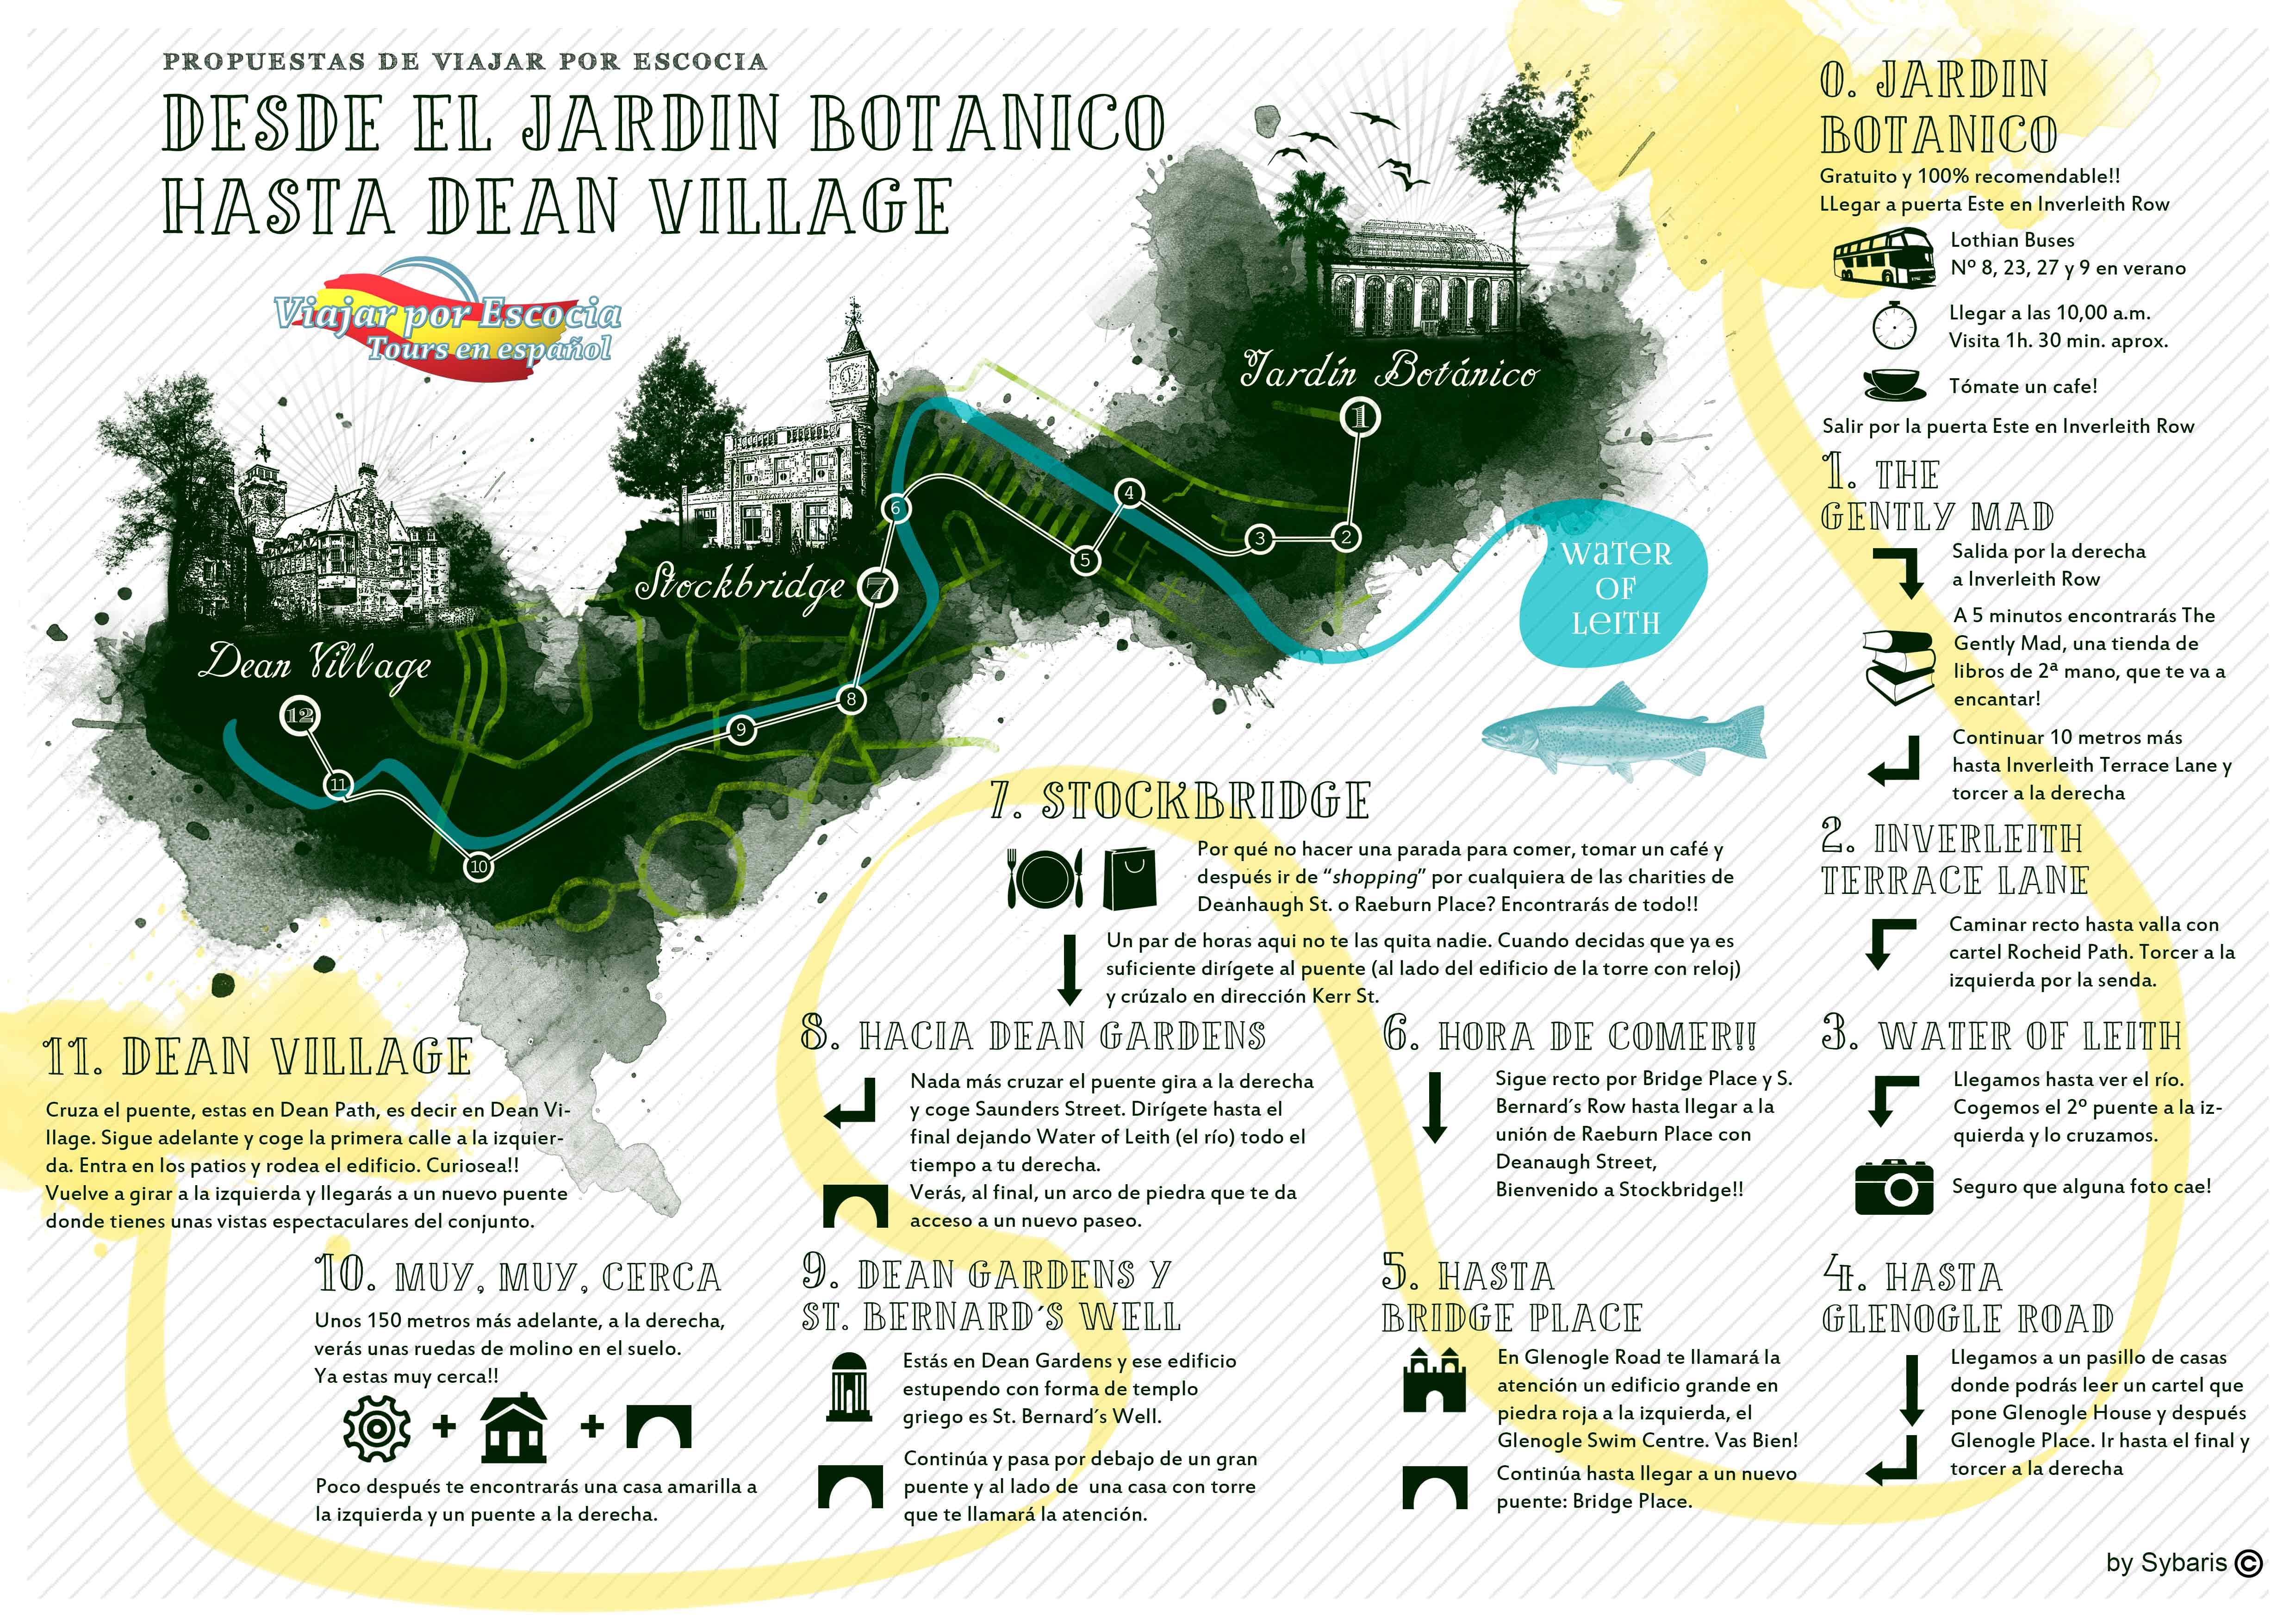 Edimburgo un paseo del jard n bot nico al dean village mapa for Jardin botanico edimburgo